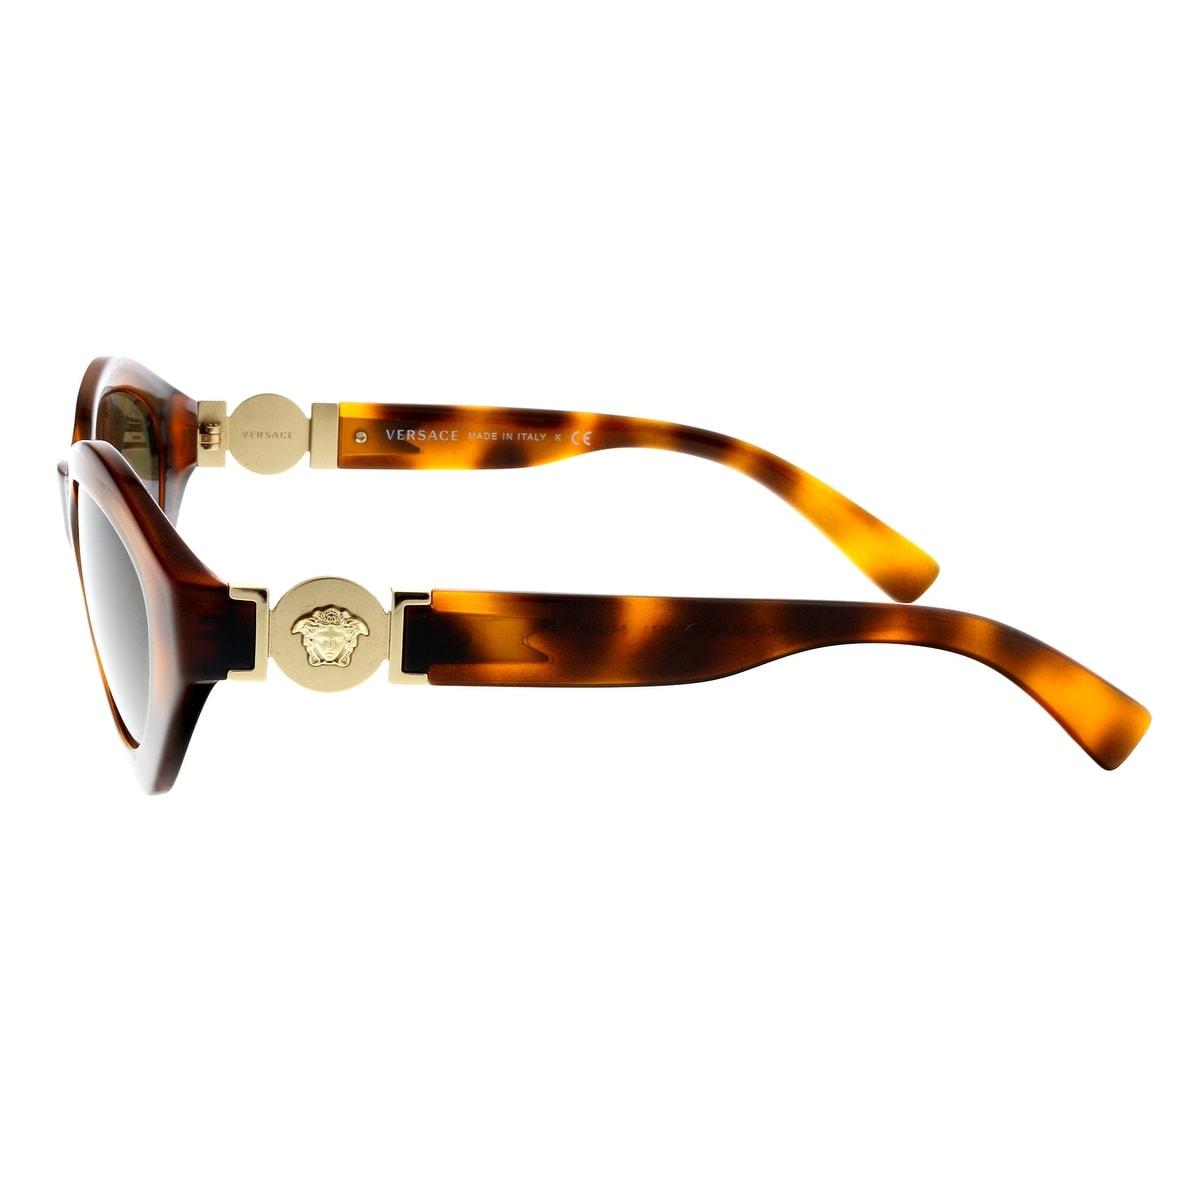 71412cc6db44 Shop Versace VE4334 511971 Havana Oval Sunglasses - 54-18-140 - Free  Shipping Today - Overstock - 28309409